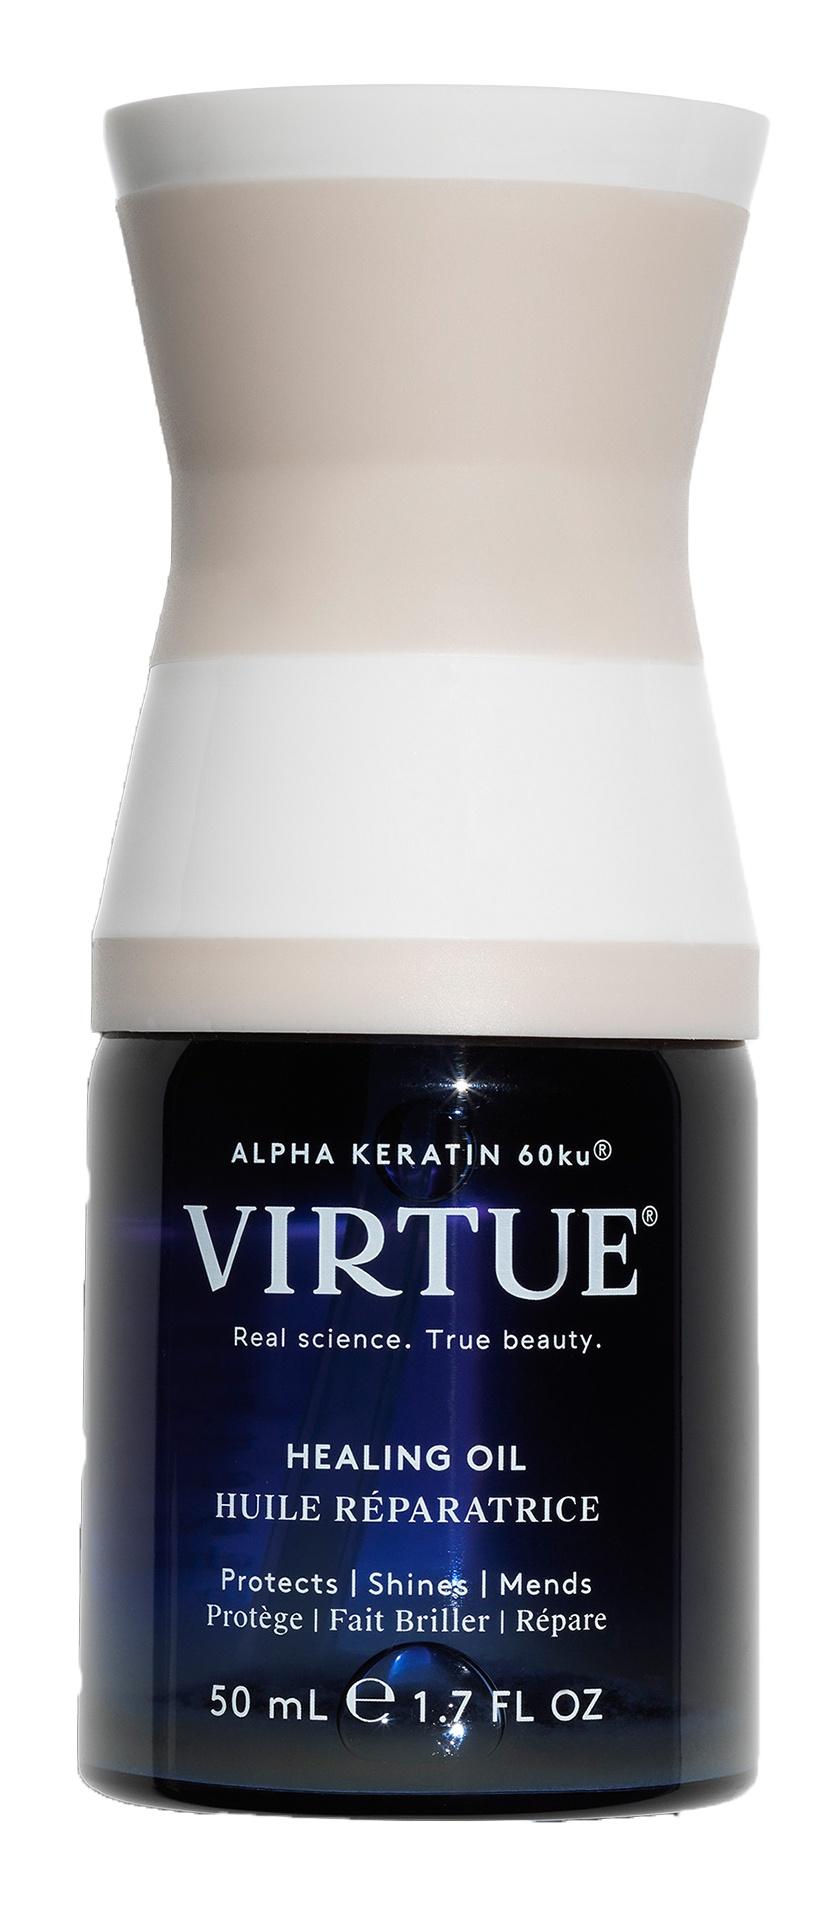 virtue Healing Oil